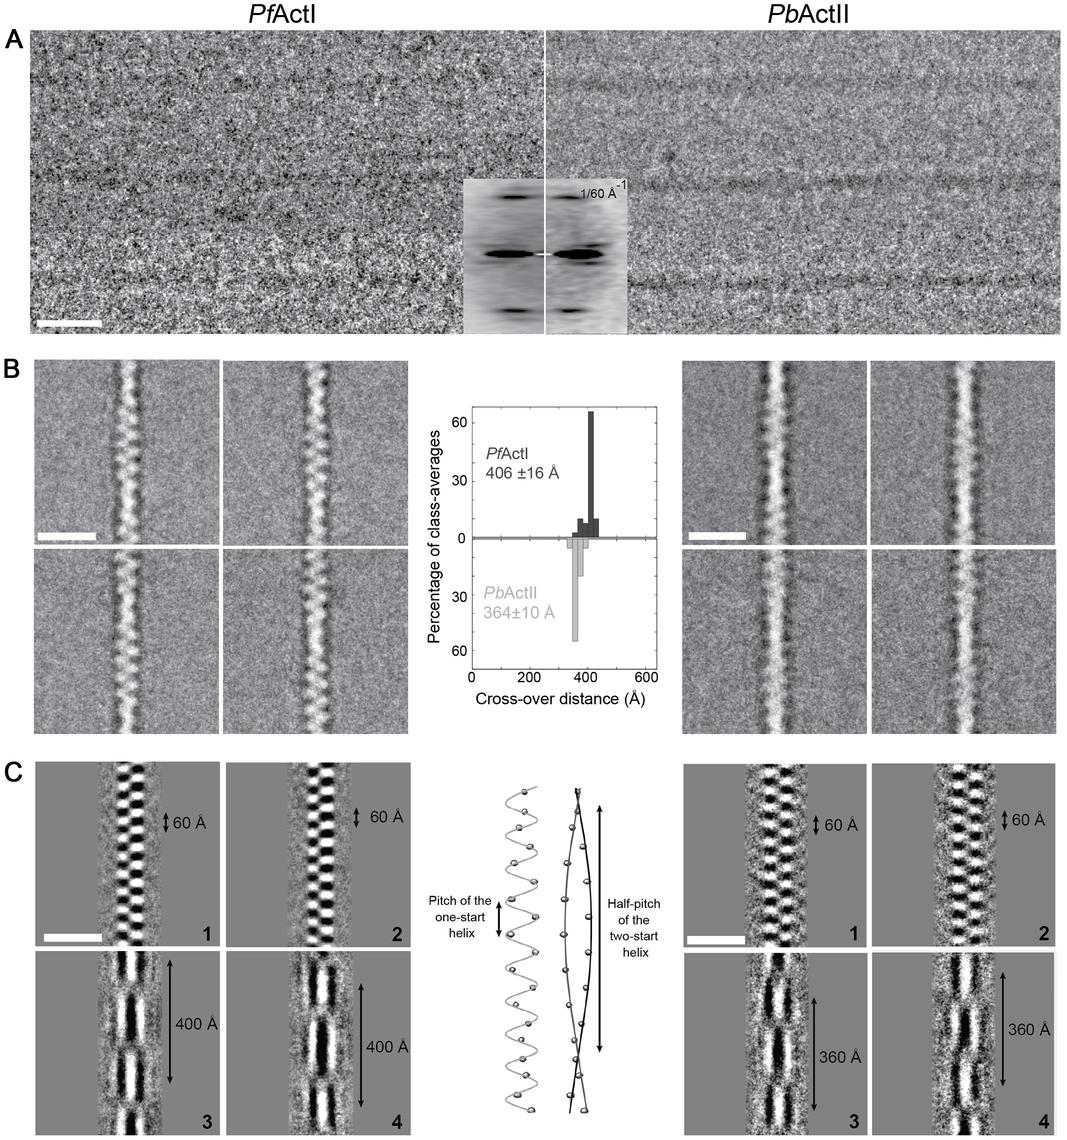 Cryo-EM image analysis of actin I and II.